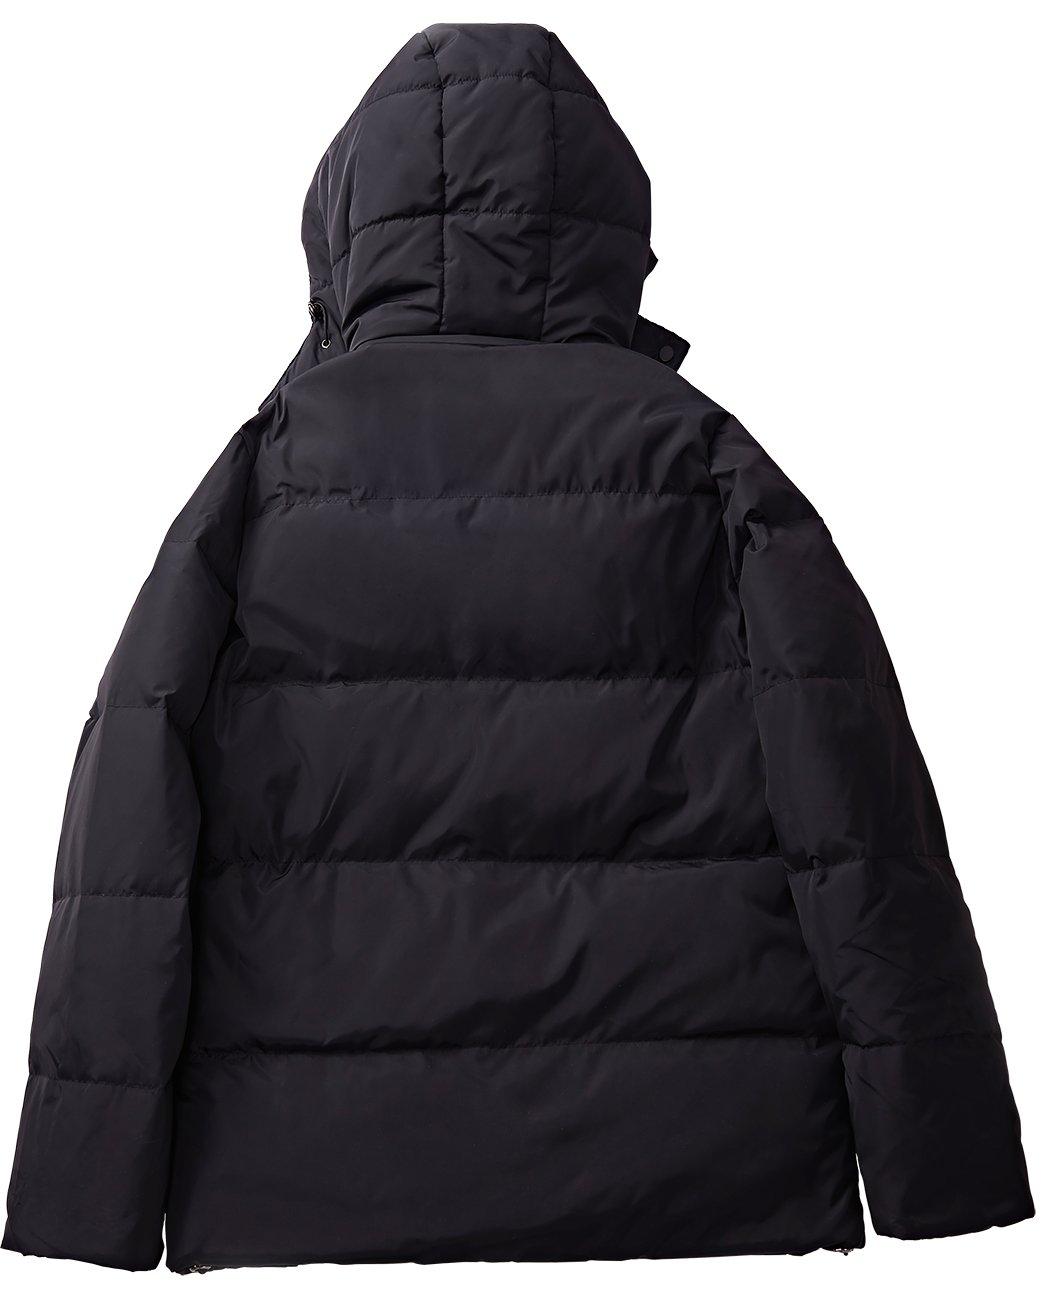 YIWEI Men\'s 650 Fill Down Puffer Jacket With Hood